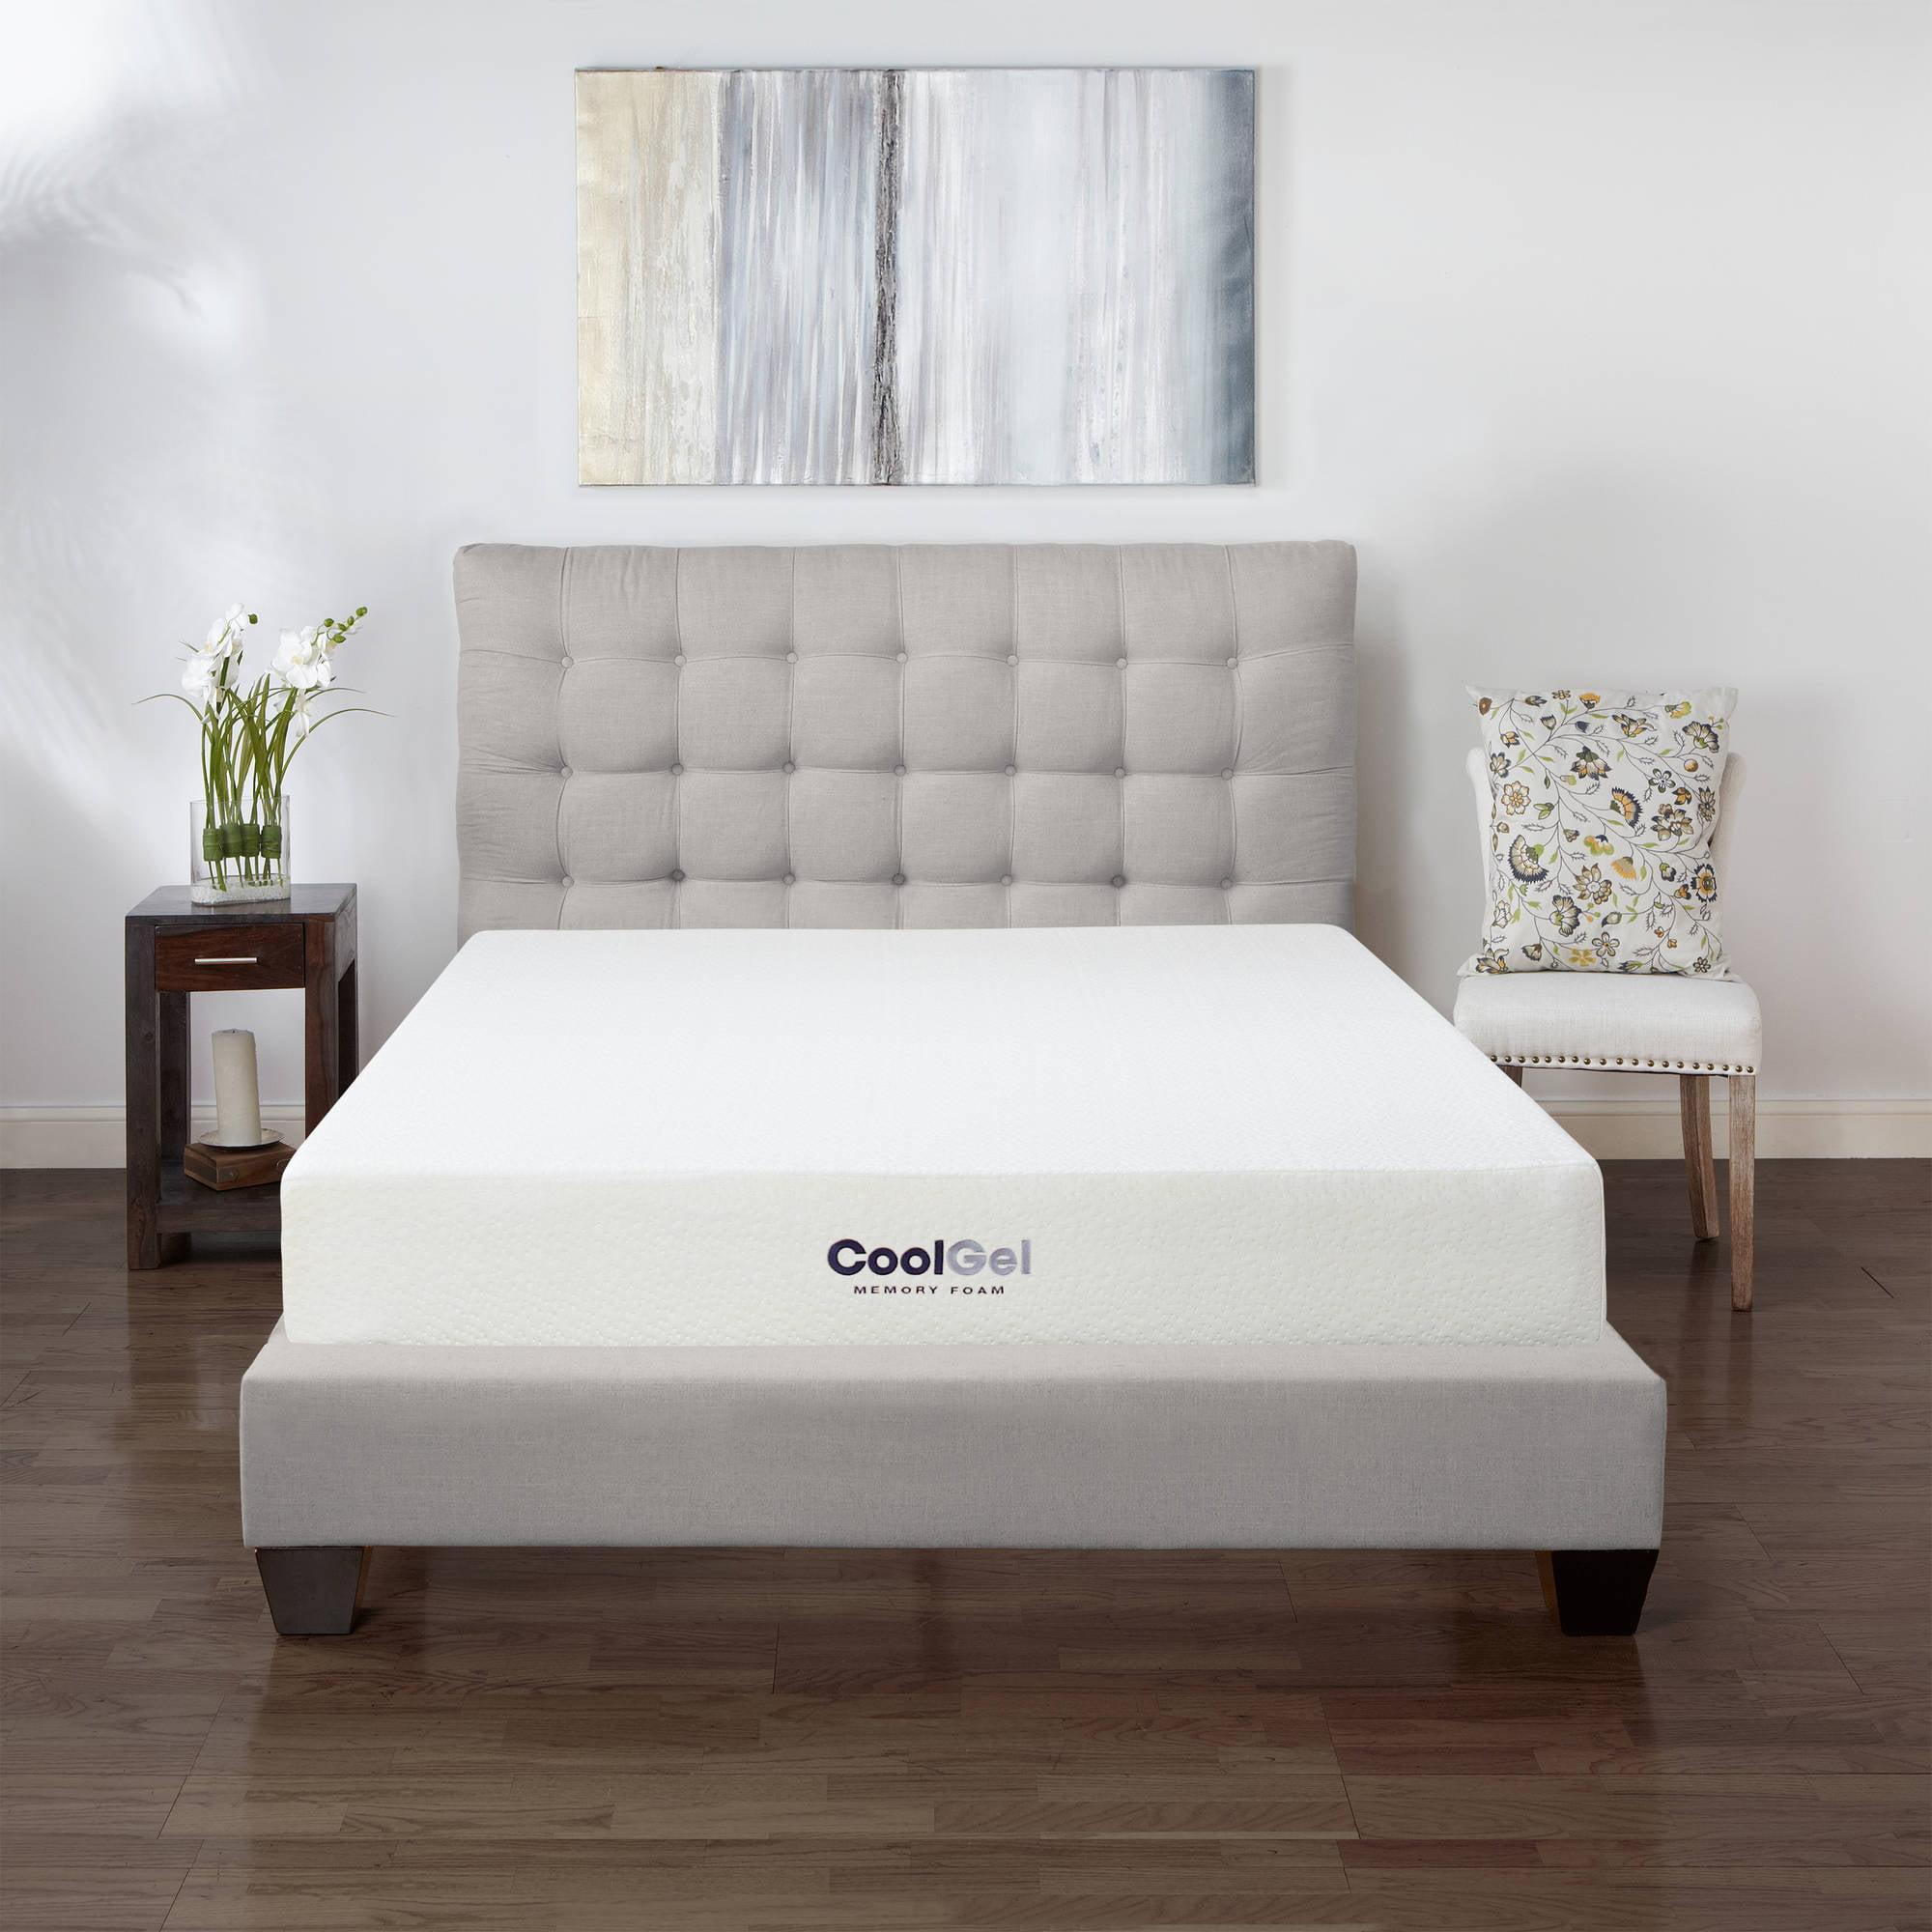 "Modern Sleep Cool Gel 8"" High Ventilated Gel Memory Foam Mattress"